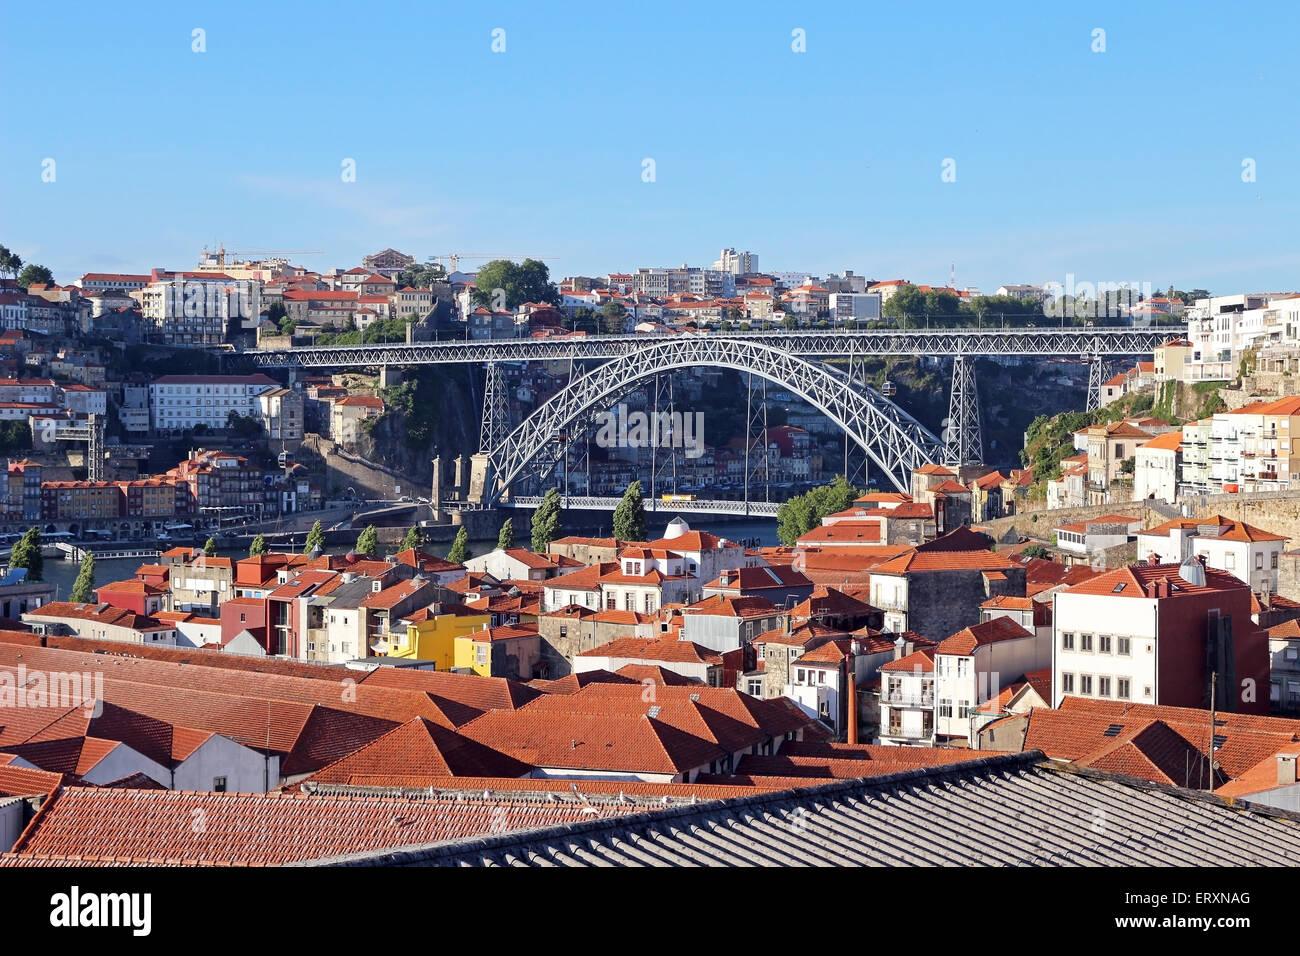 Dom Lus Bridge Oporto - Stock Image